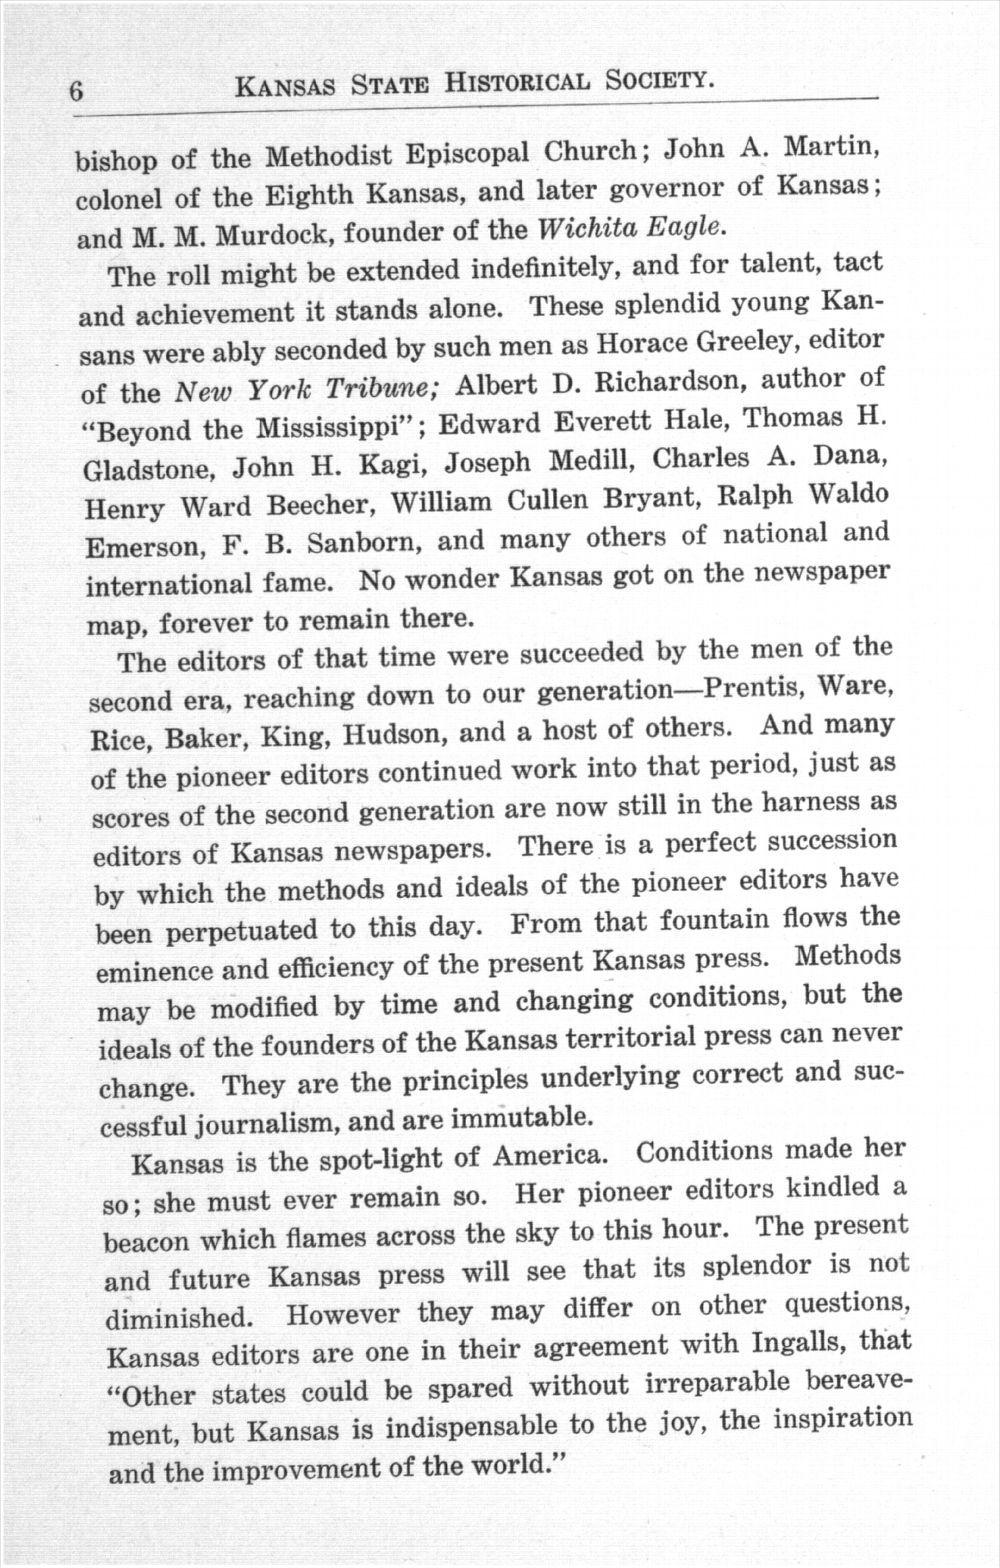 History of Kansas newspapers - 6